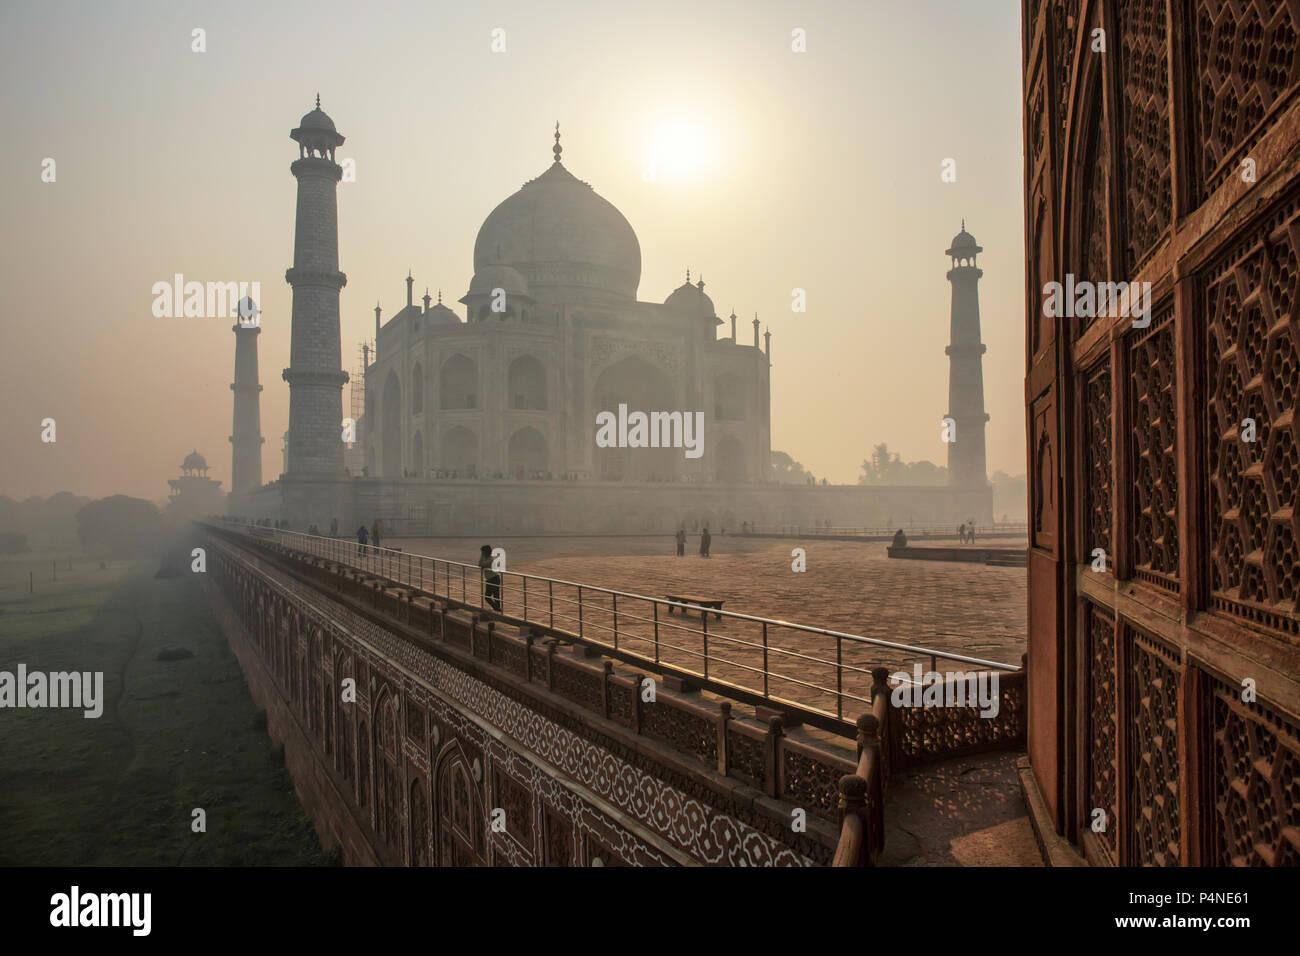 Das wunderschöne Taj Mahal am Morgen, Agra - Indien Stockbild